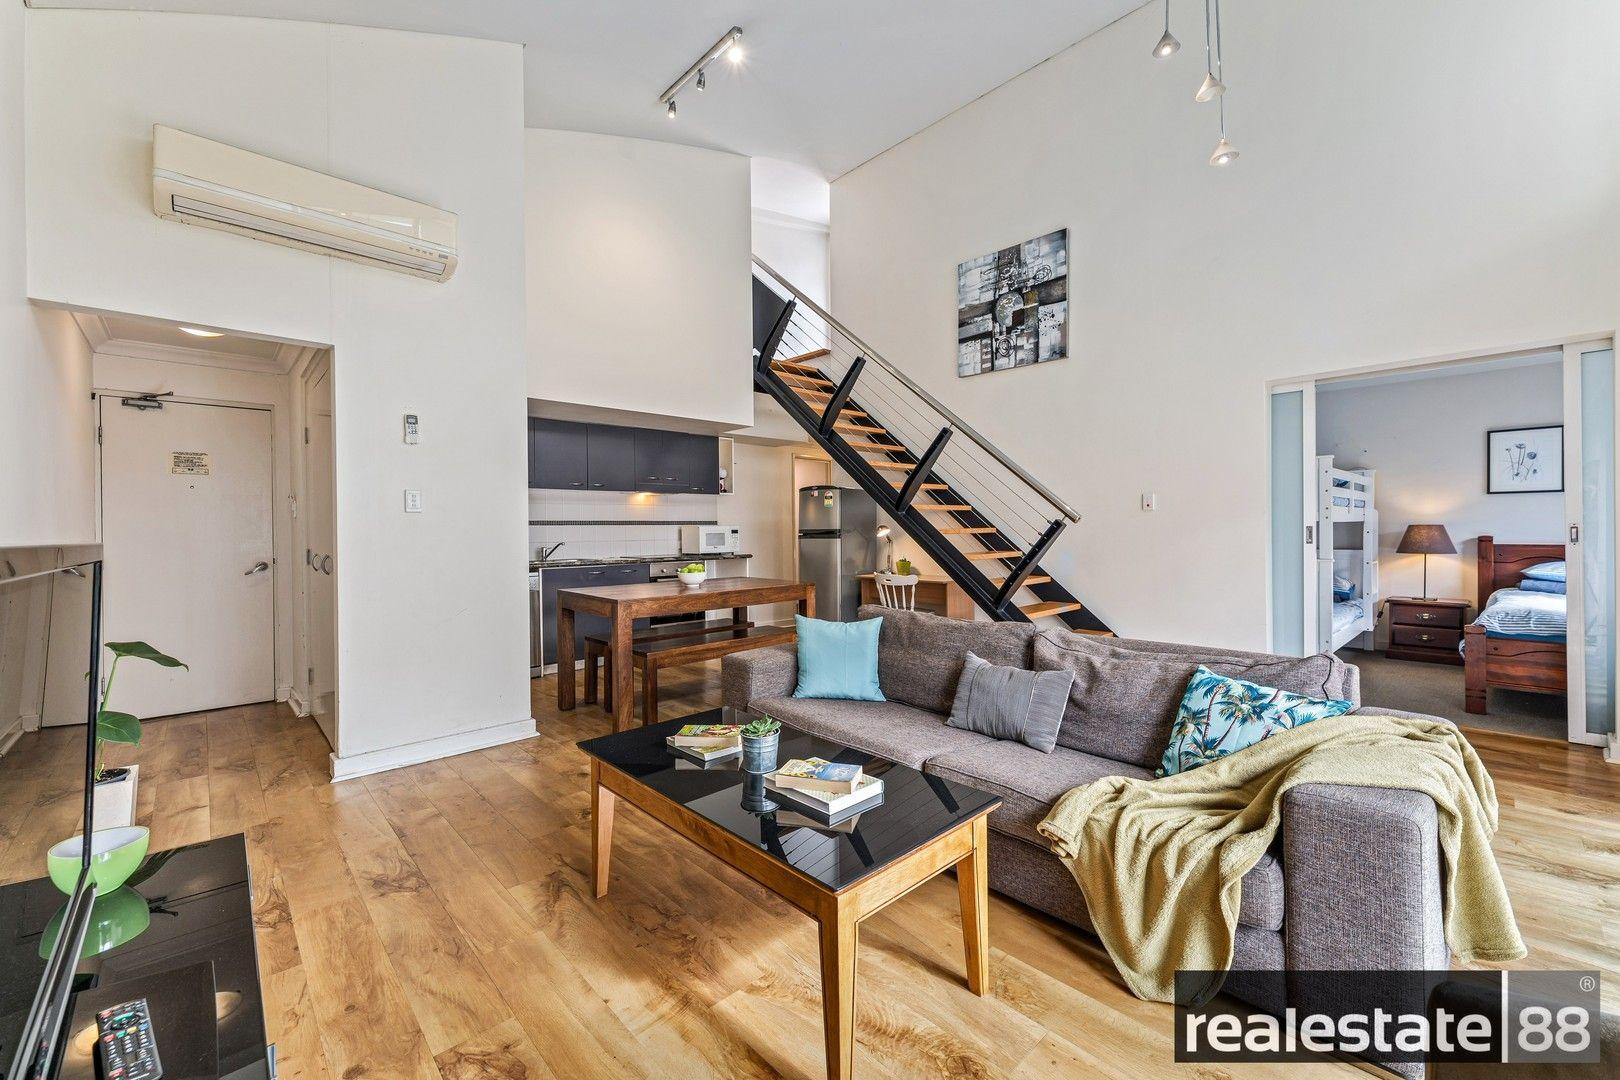 2 bedrooms Apartment / Unit / Flat in 612/112 Mounts Bay Road PERTH WA, 6000